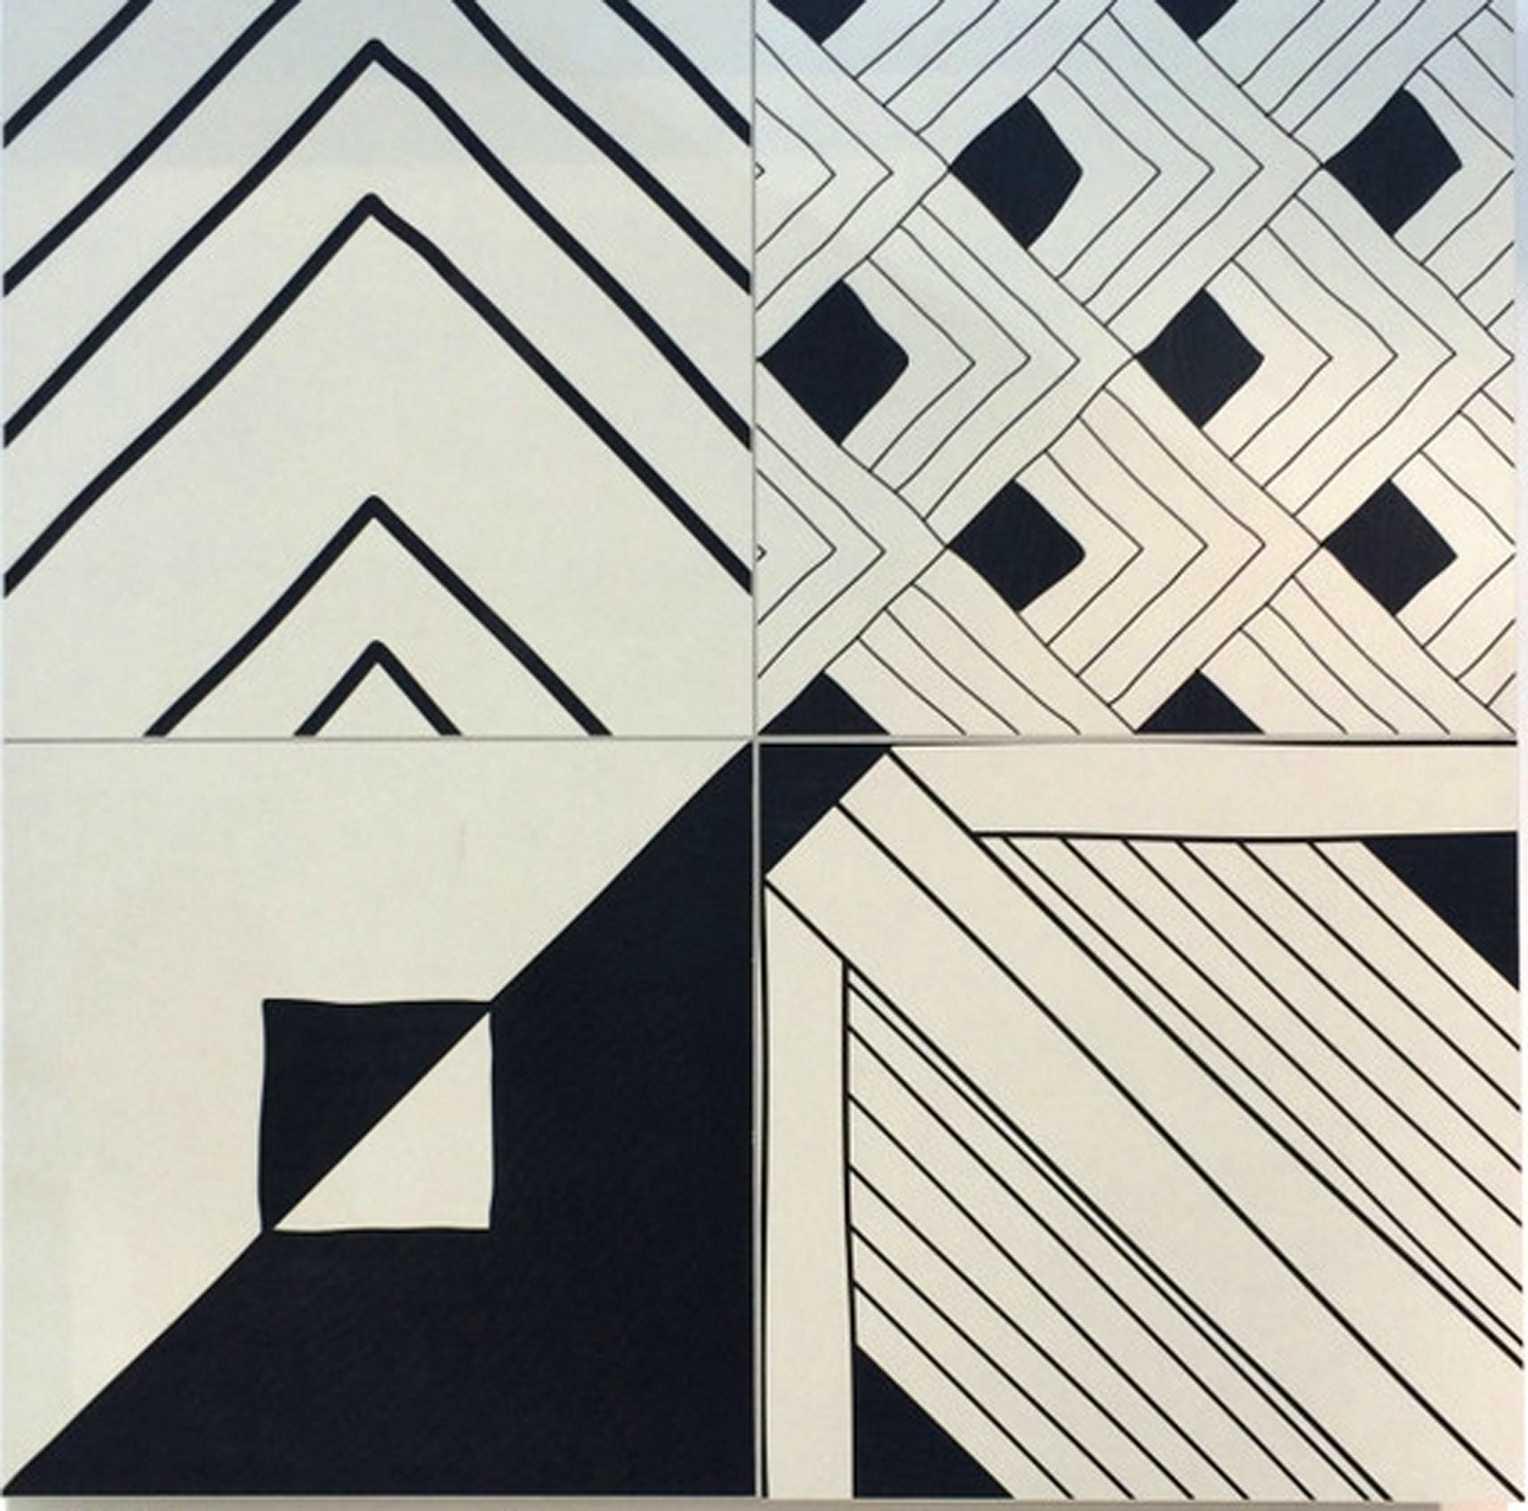 Ornamenta's Tangle tile collection